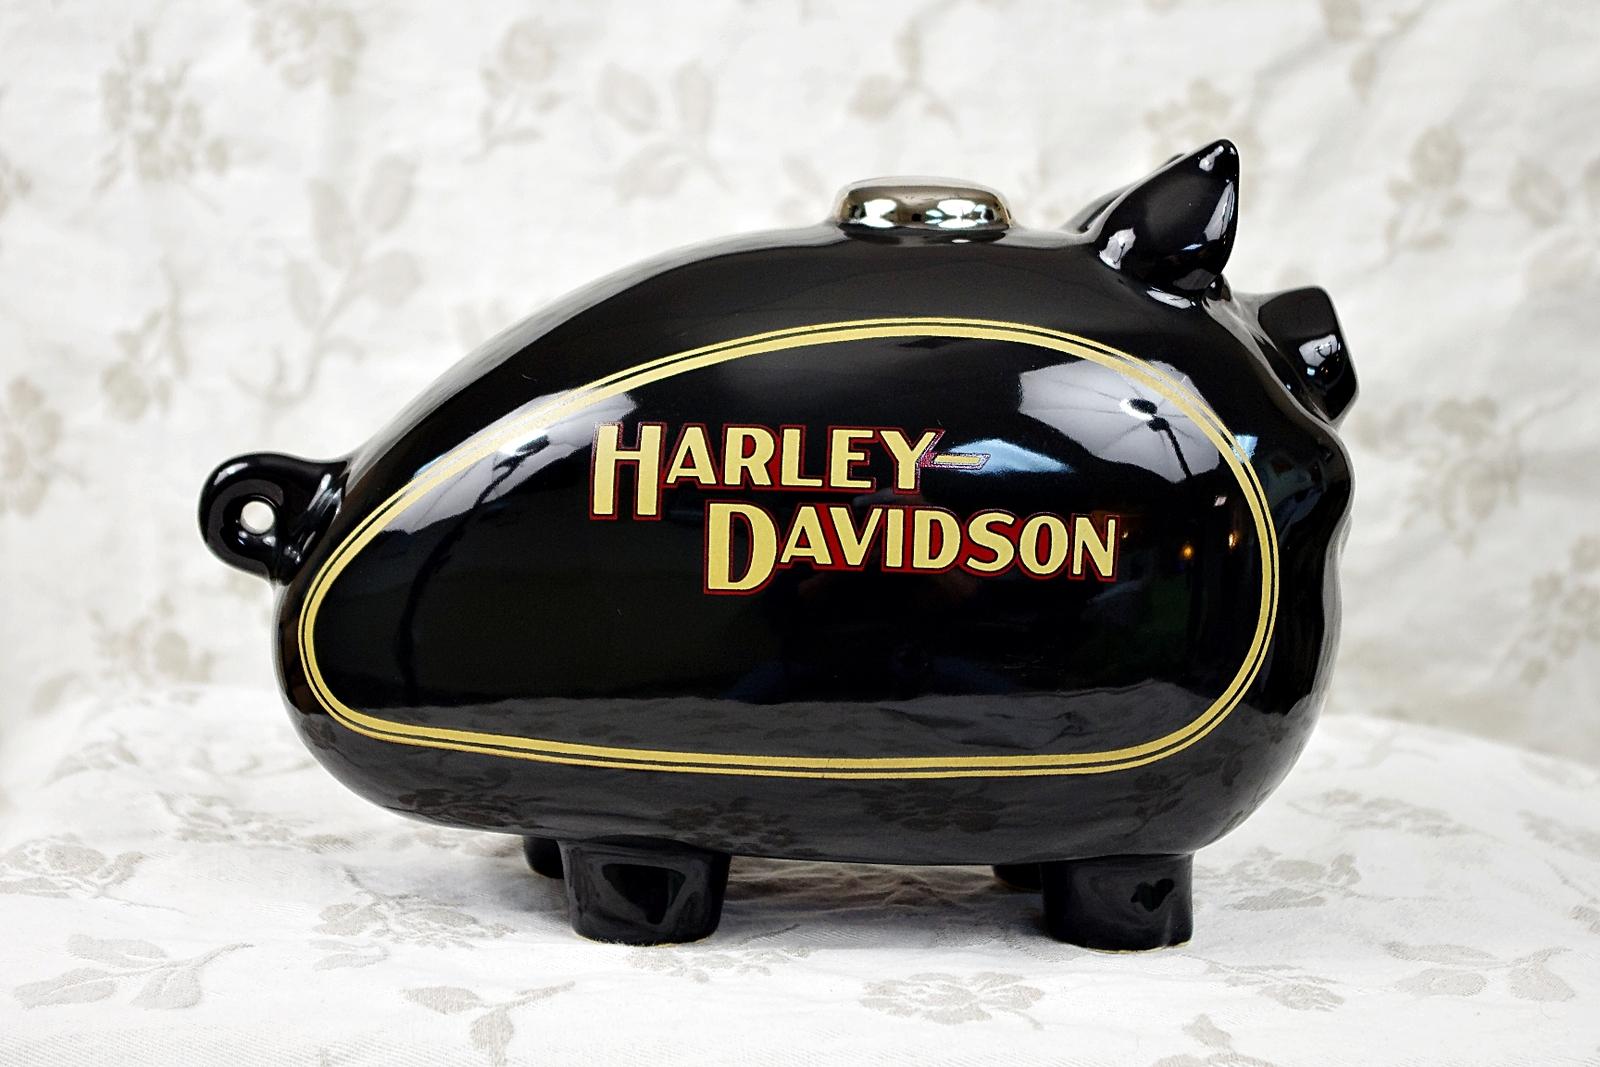 Harley Davidson Hog Bank Uk